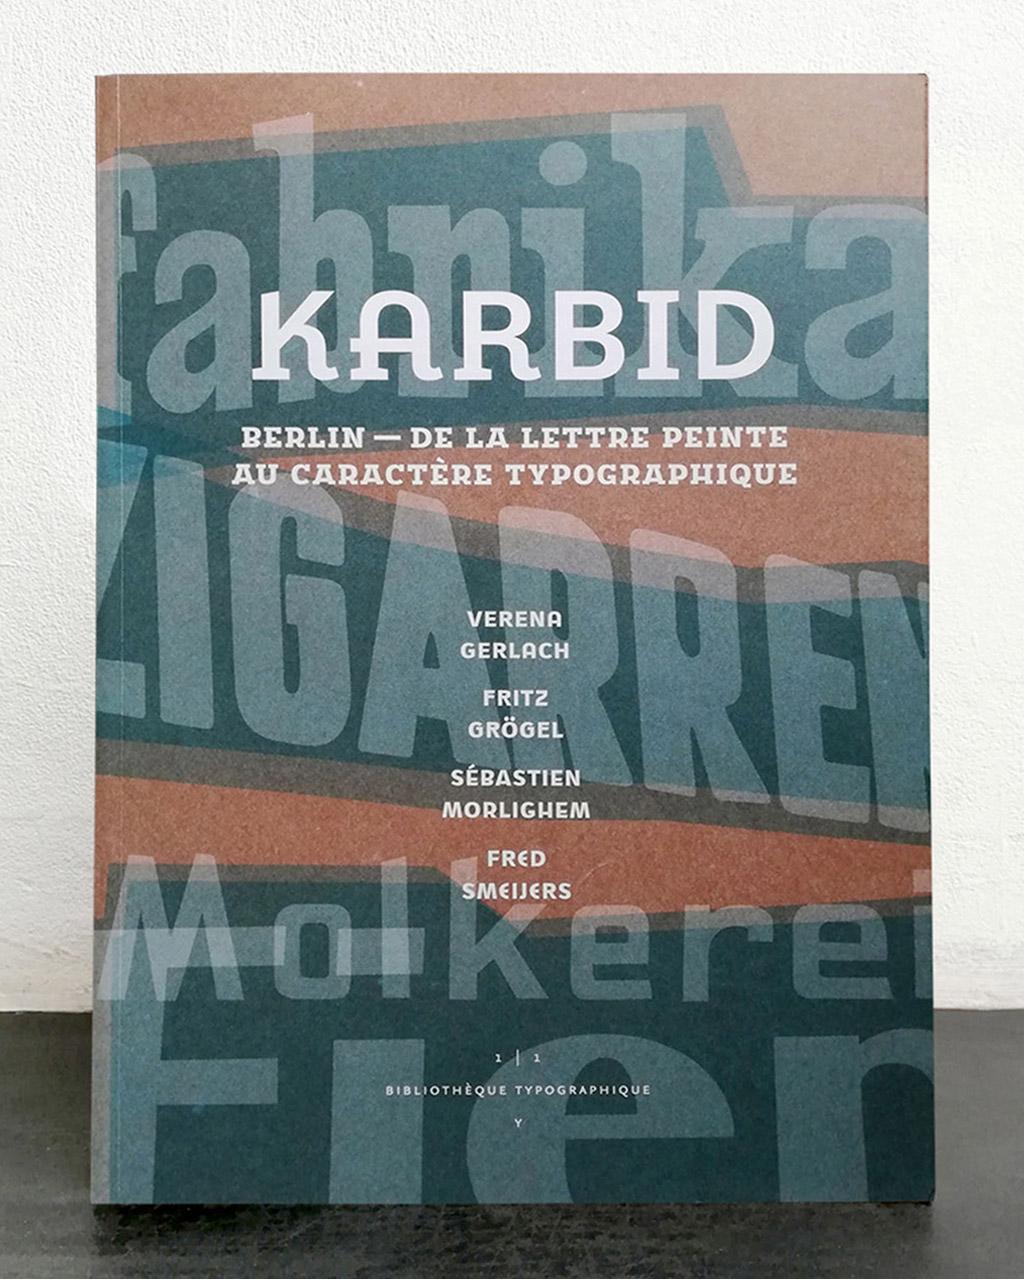 KARBID: The Book